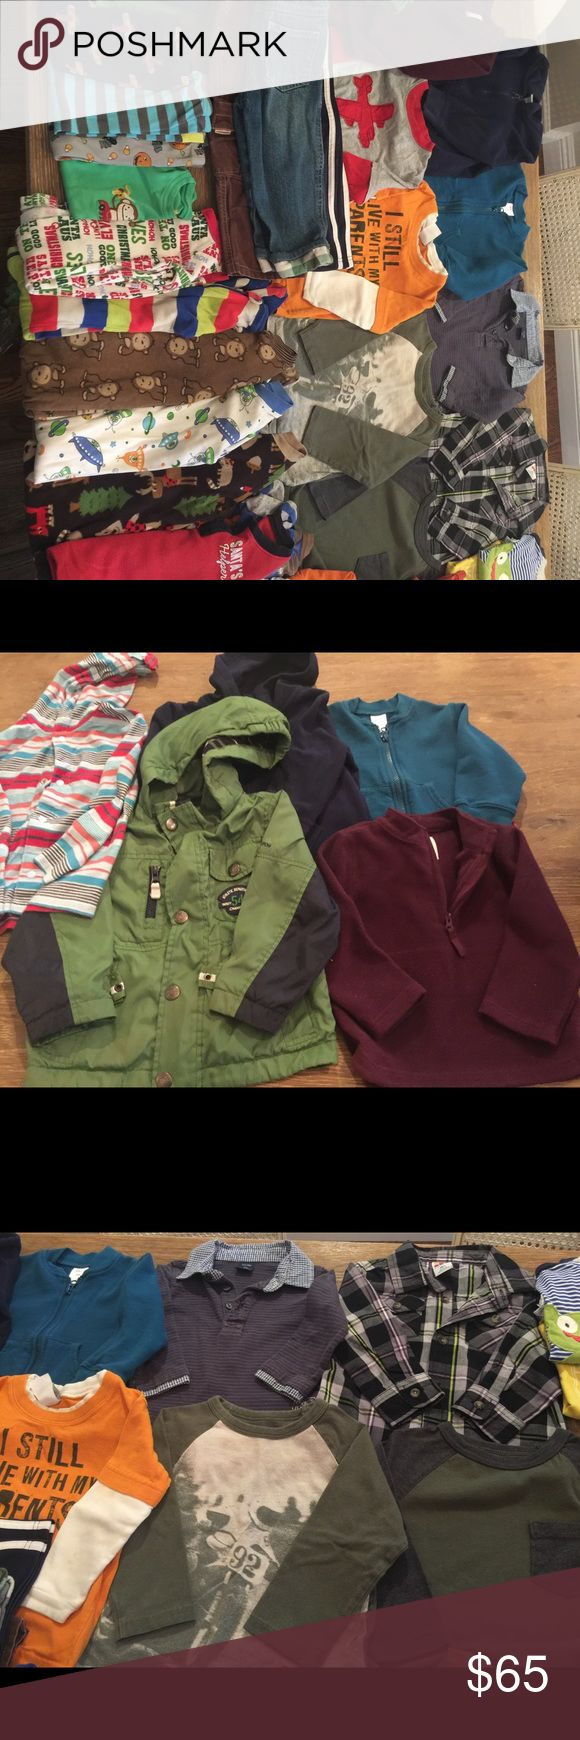 Boys lot size 18mo-2T great condition 1-Coat, 3-jackets, 1-pullover, 3-pants, 3-pajama pants, 1-pajama shirt, 6-sleeper pajamas, 1-plaid shirt, 7-long sleeve, 2-short sleeve. Gymboree, carter's, baby Gap, old navy. Shirts & Tops Sweatshirts & Hoodies